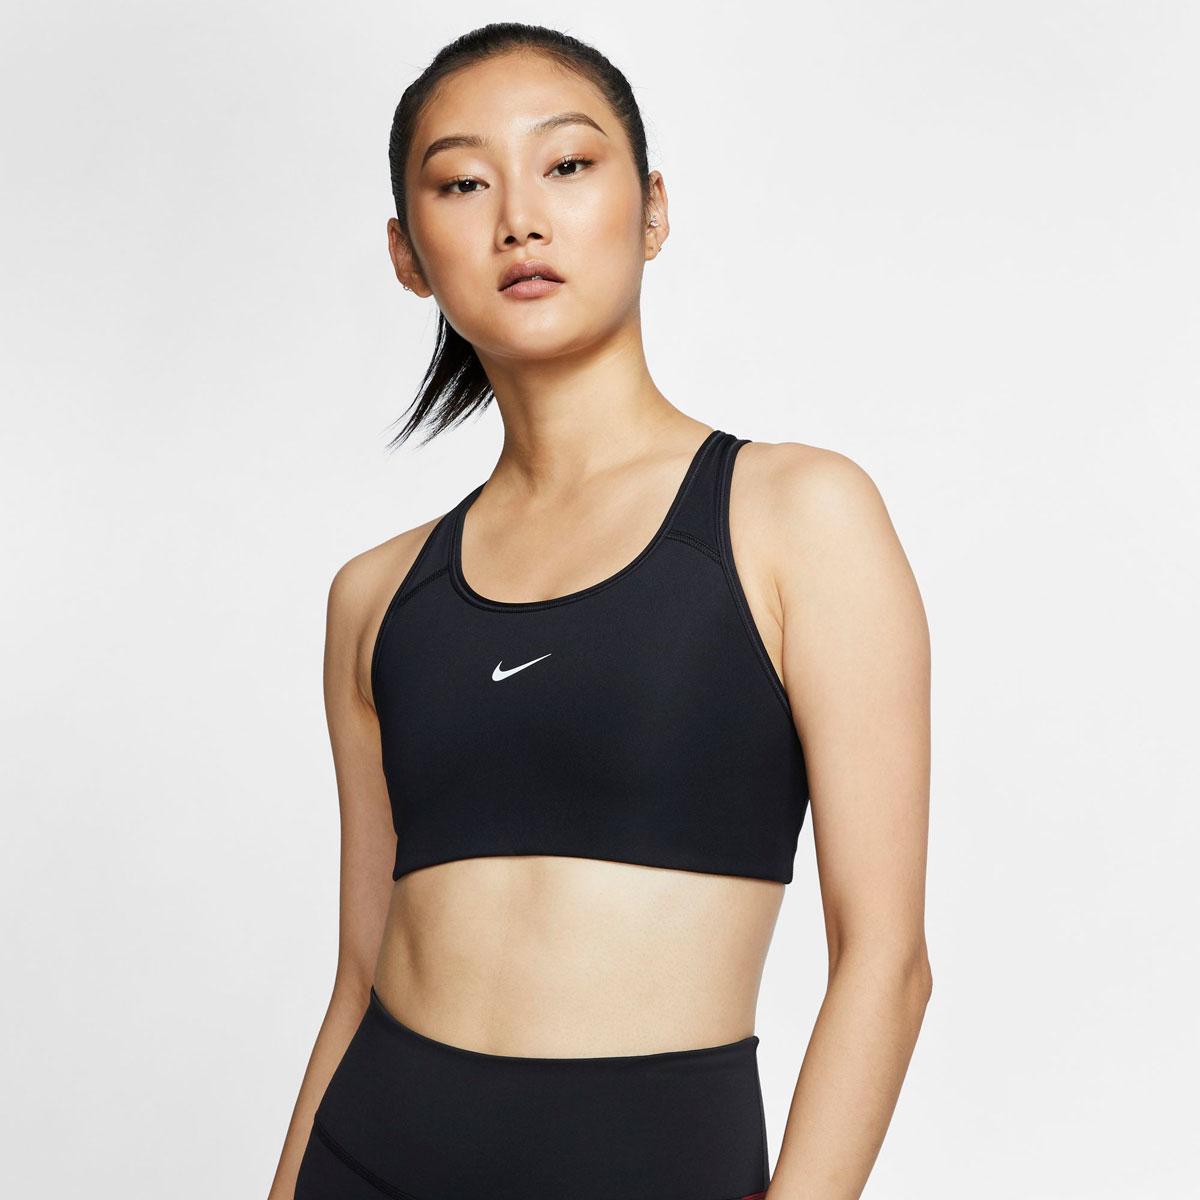 Women's Medium-Support Sports Bra, Black, swatch